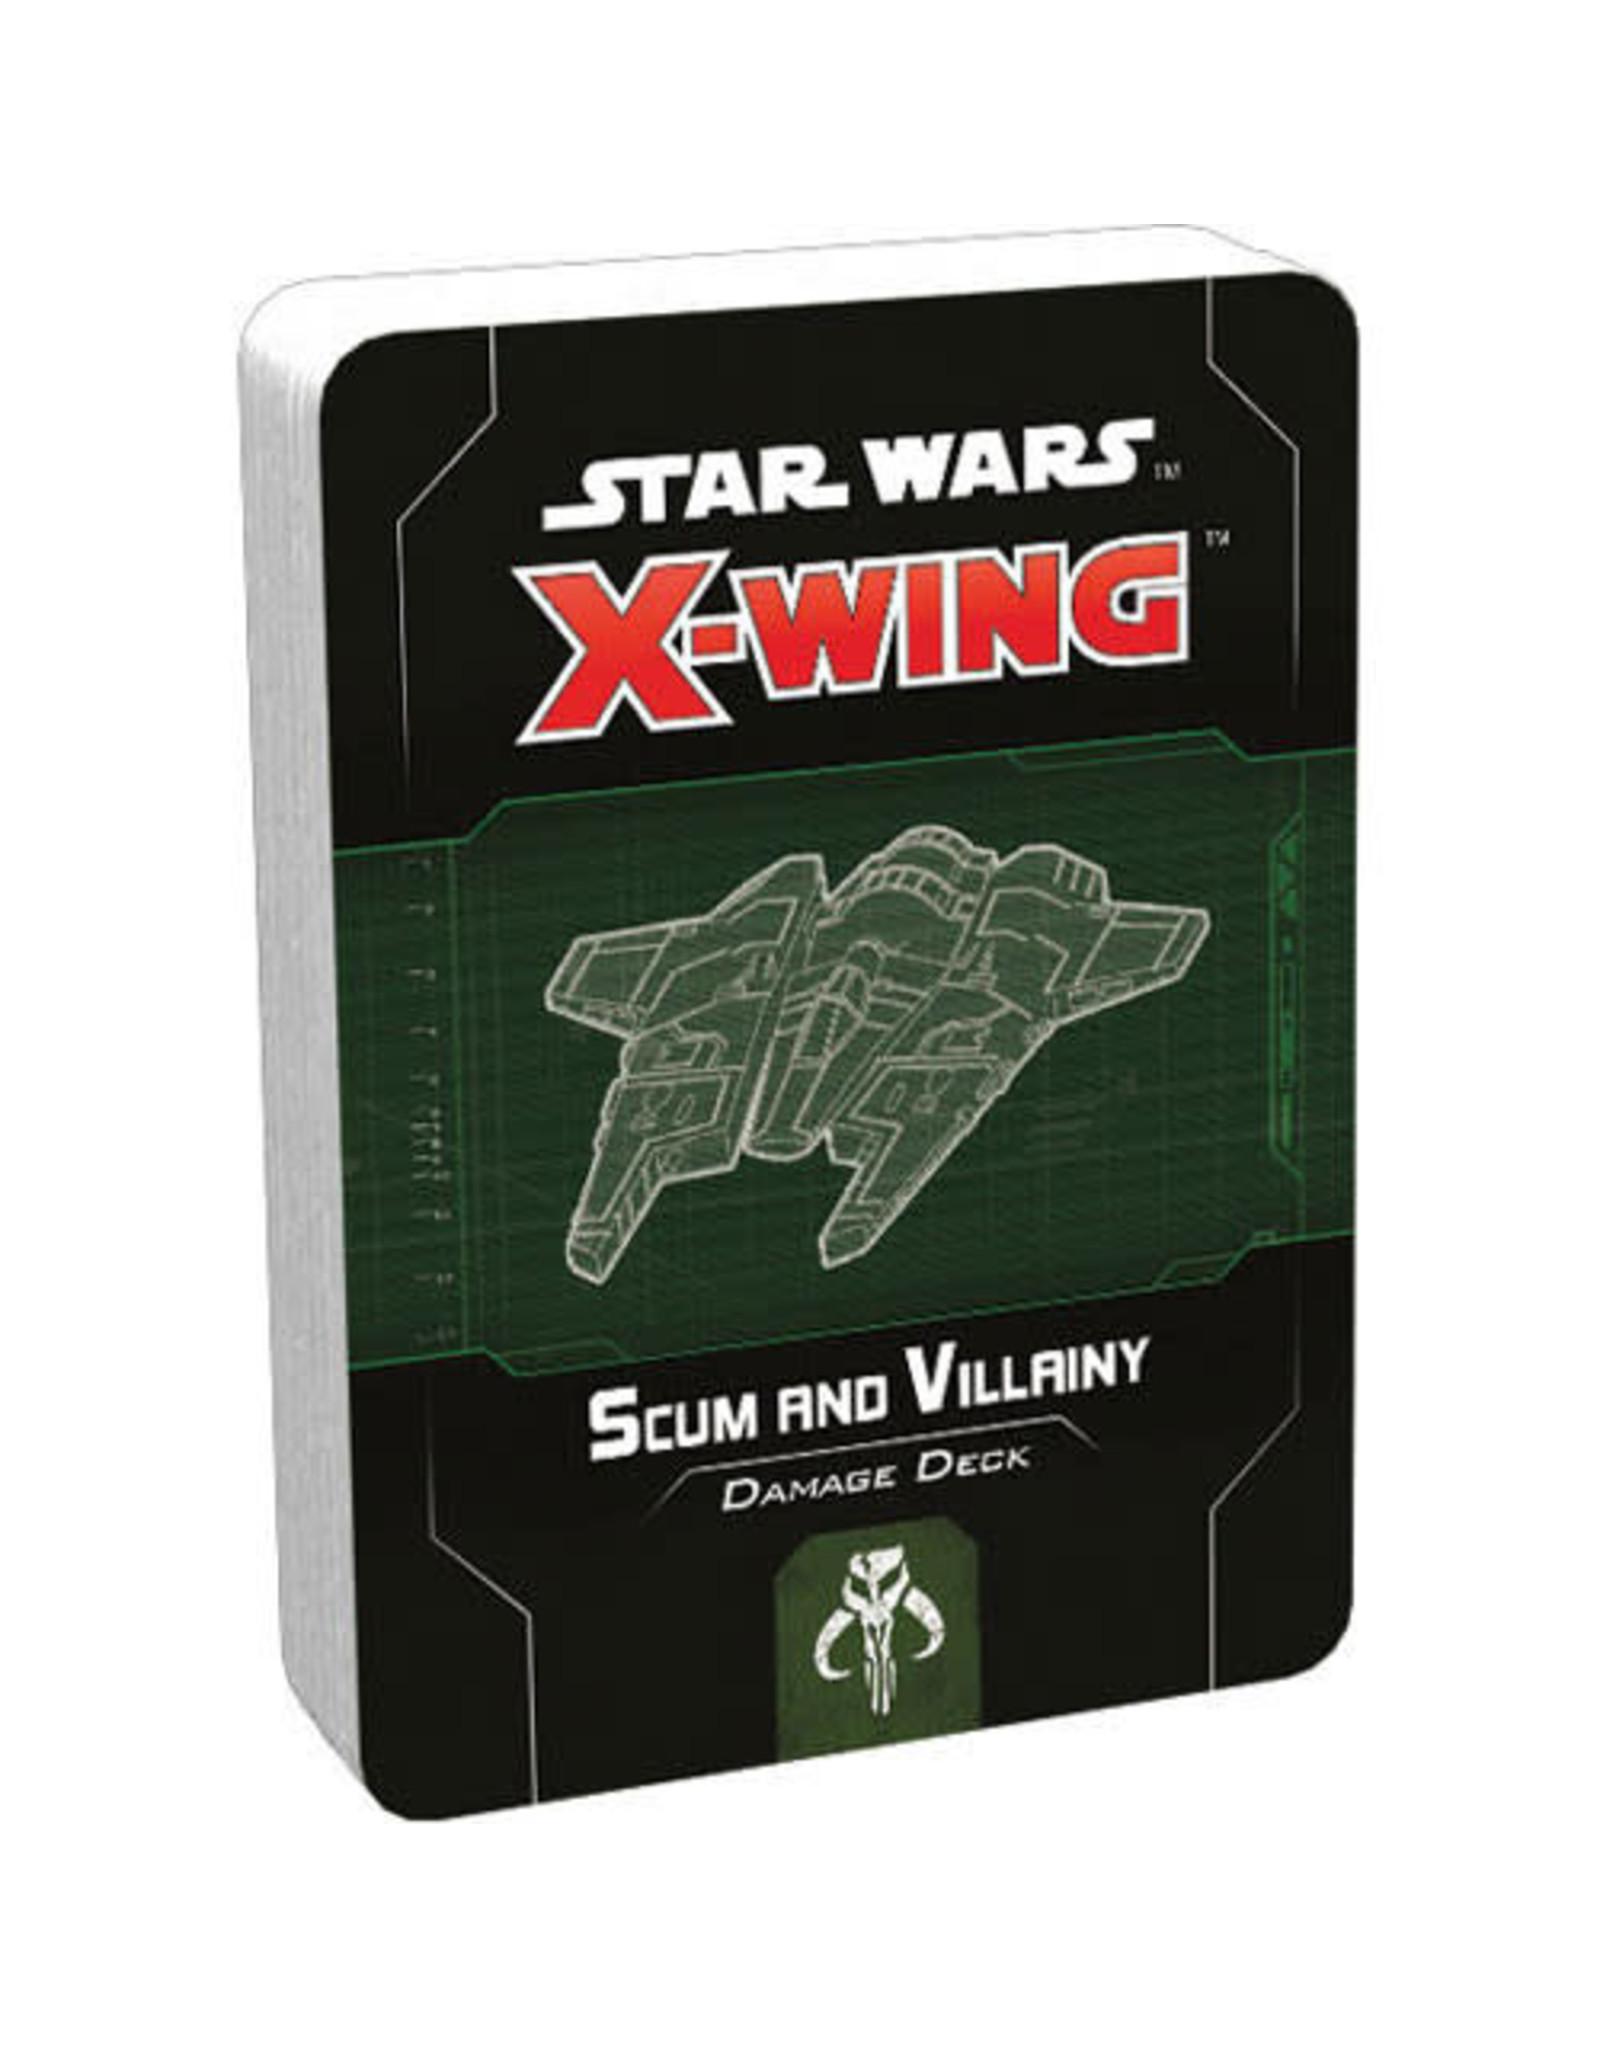 Star Wars X-Wing 2e: Scum and Villiany Damage Deck